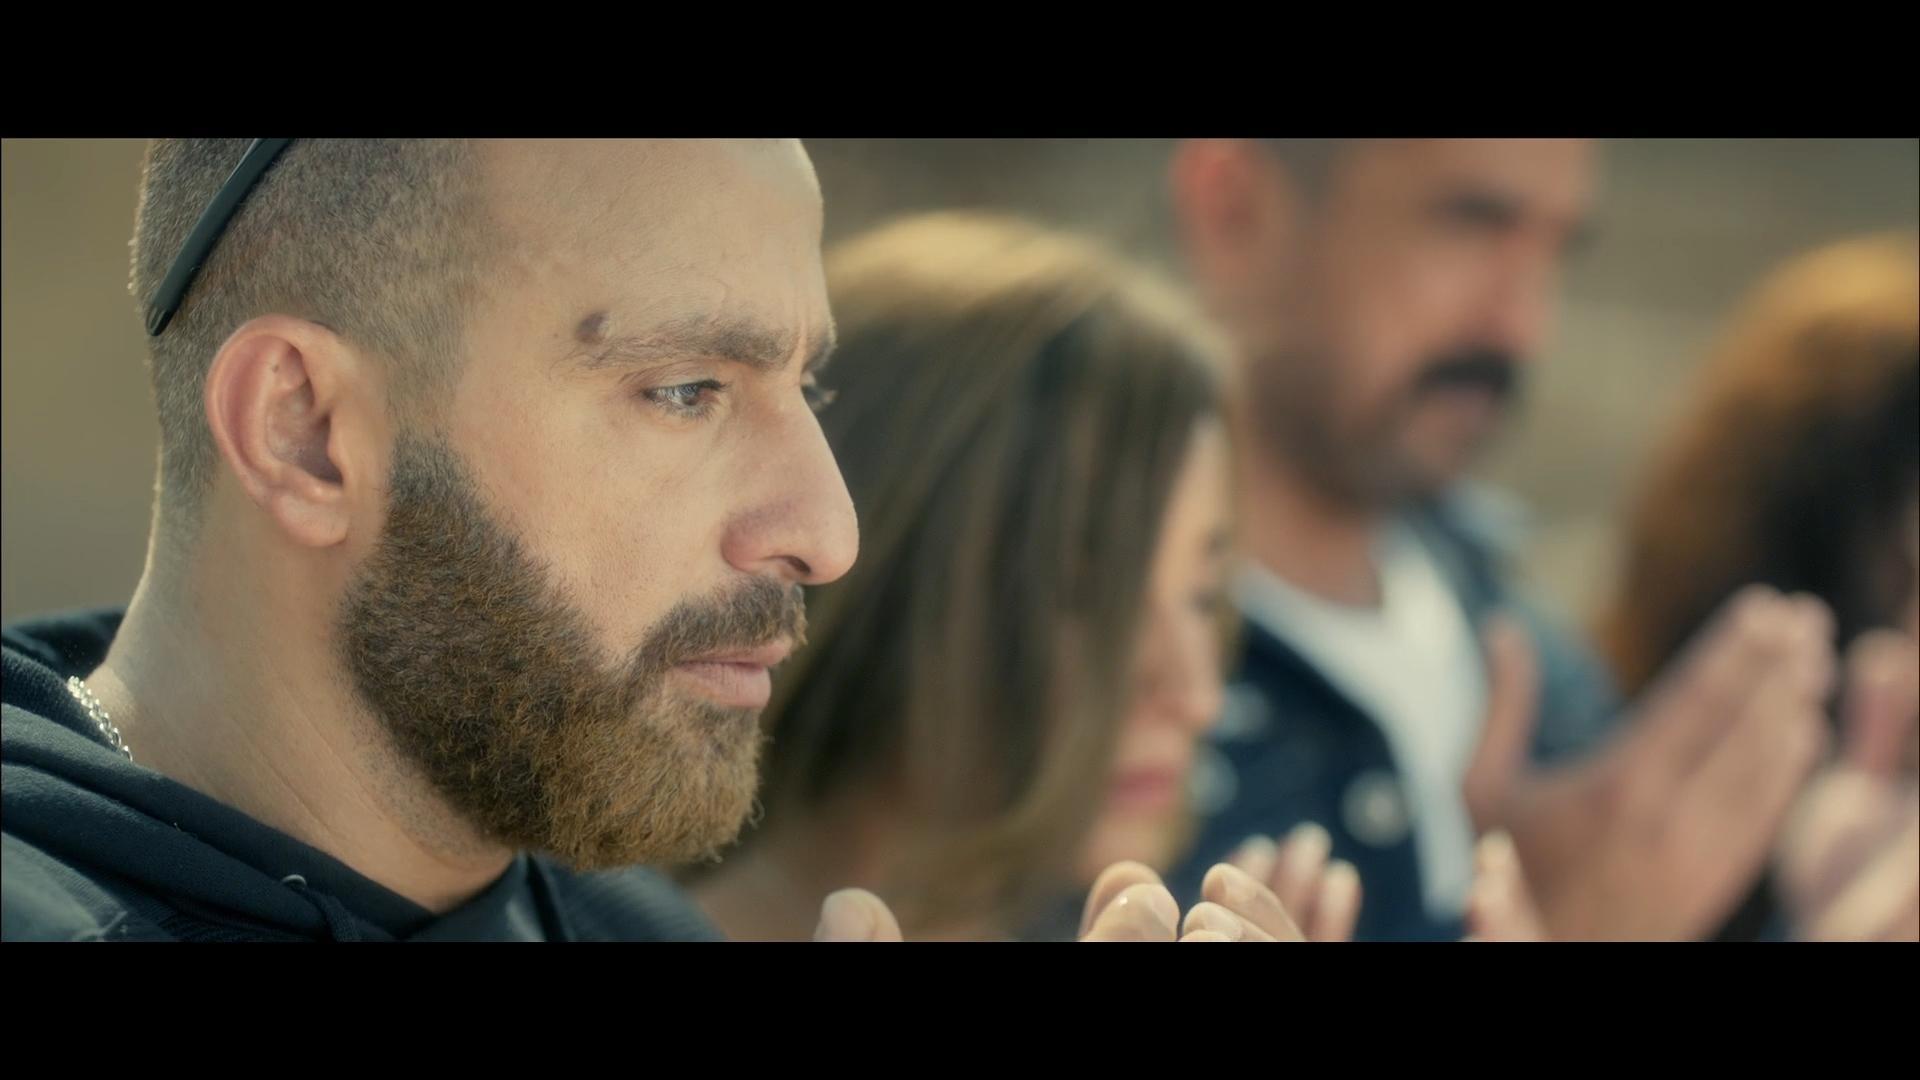 [فيلم][تورنت][تحميل][هروب اضطراري][2017][1080p][Web-DL] 16 arabp2p.com